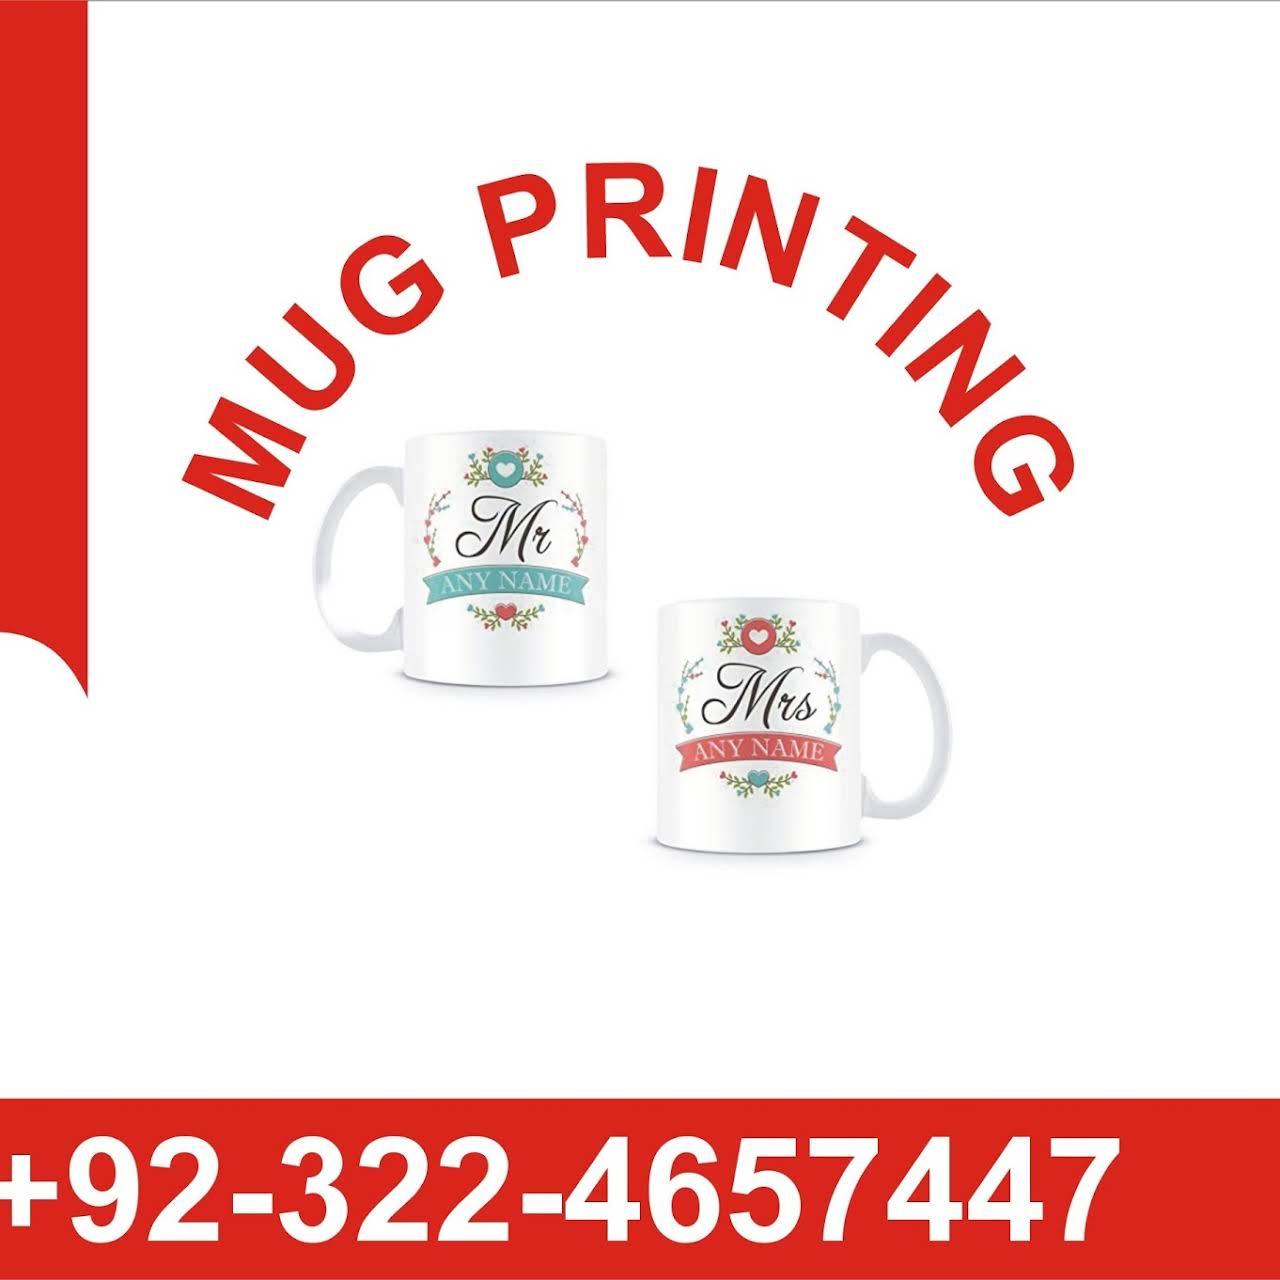 MUG PRINTING IN LAHORE - Printing & Advertisment